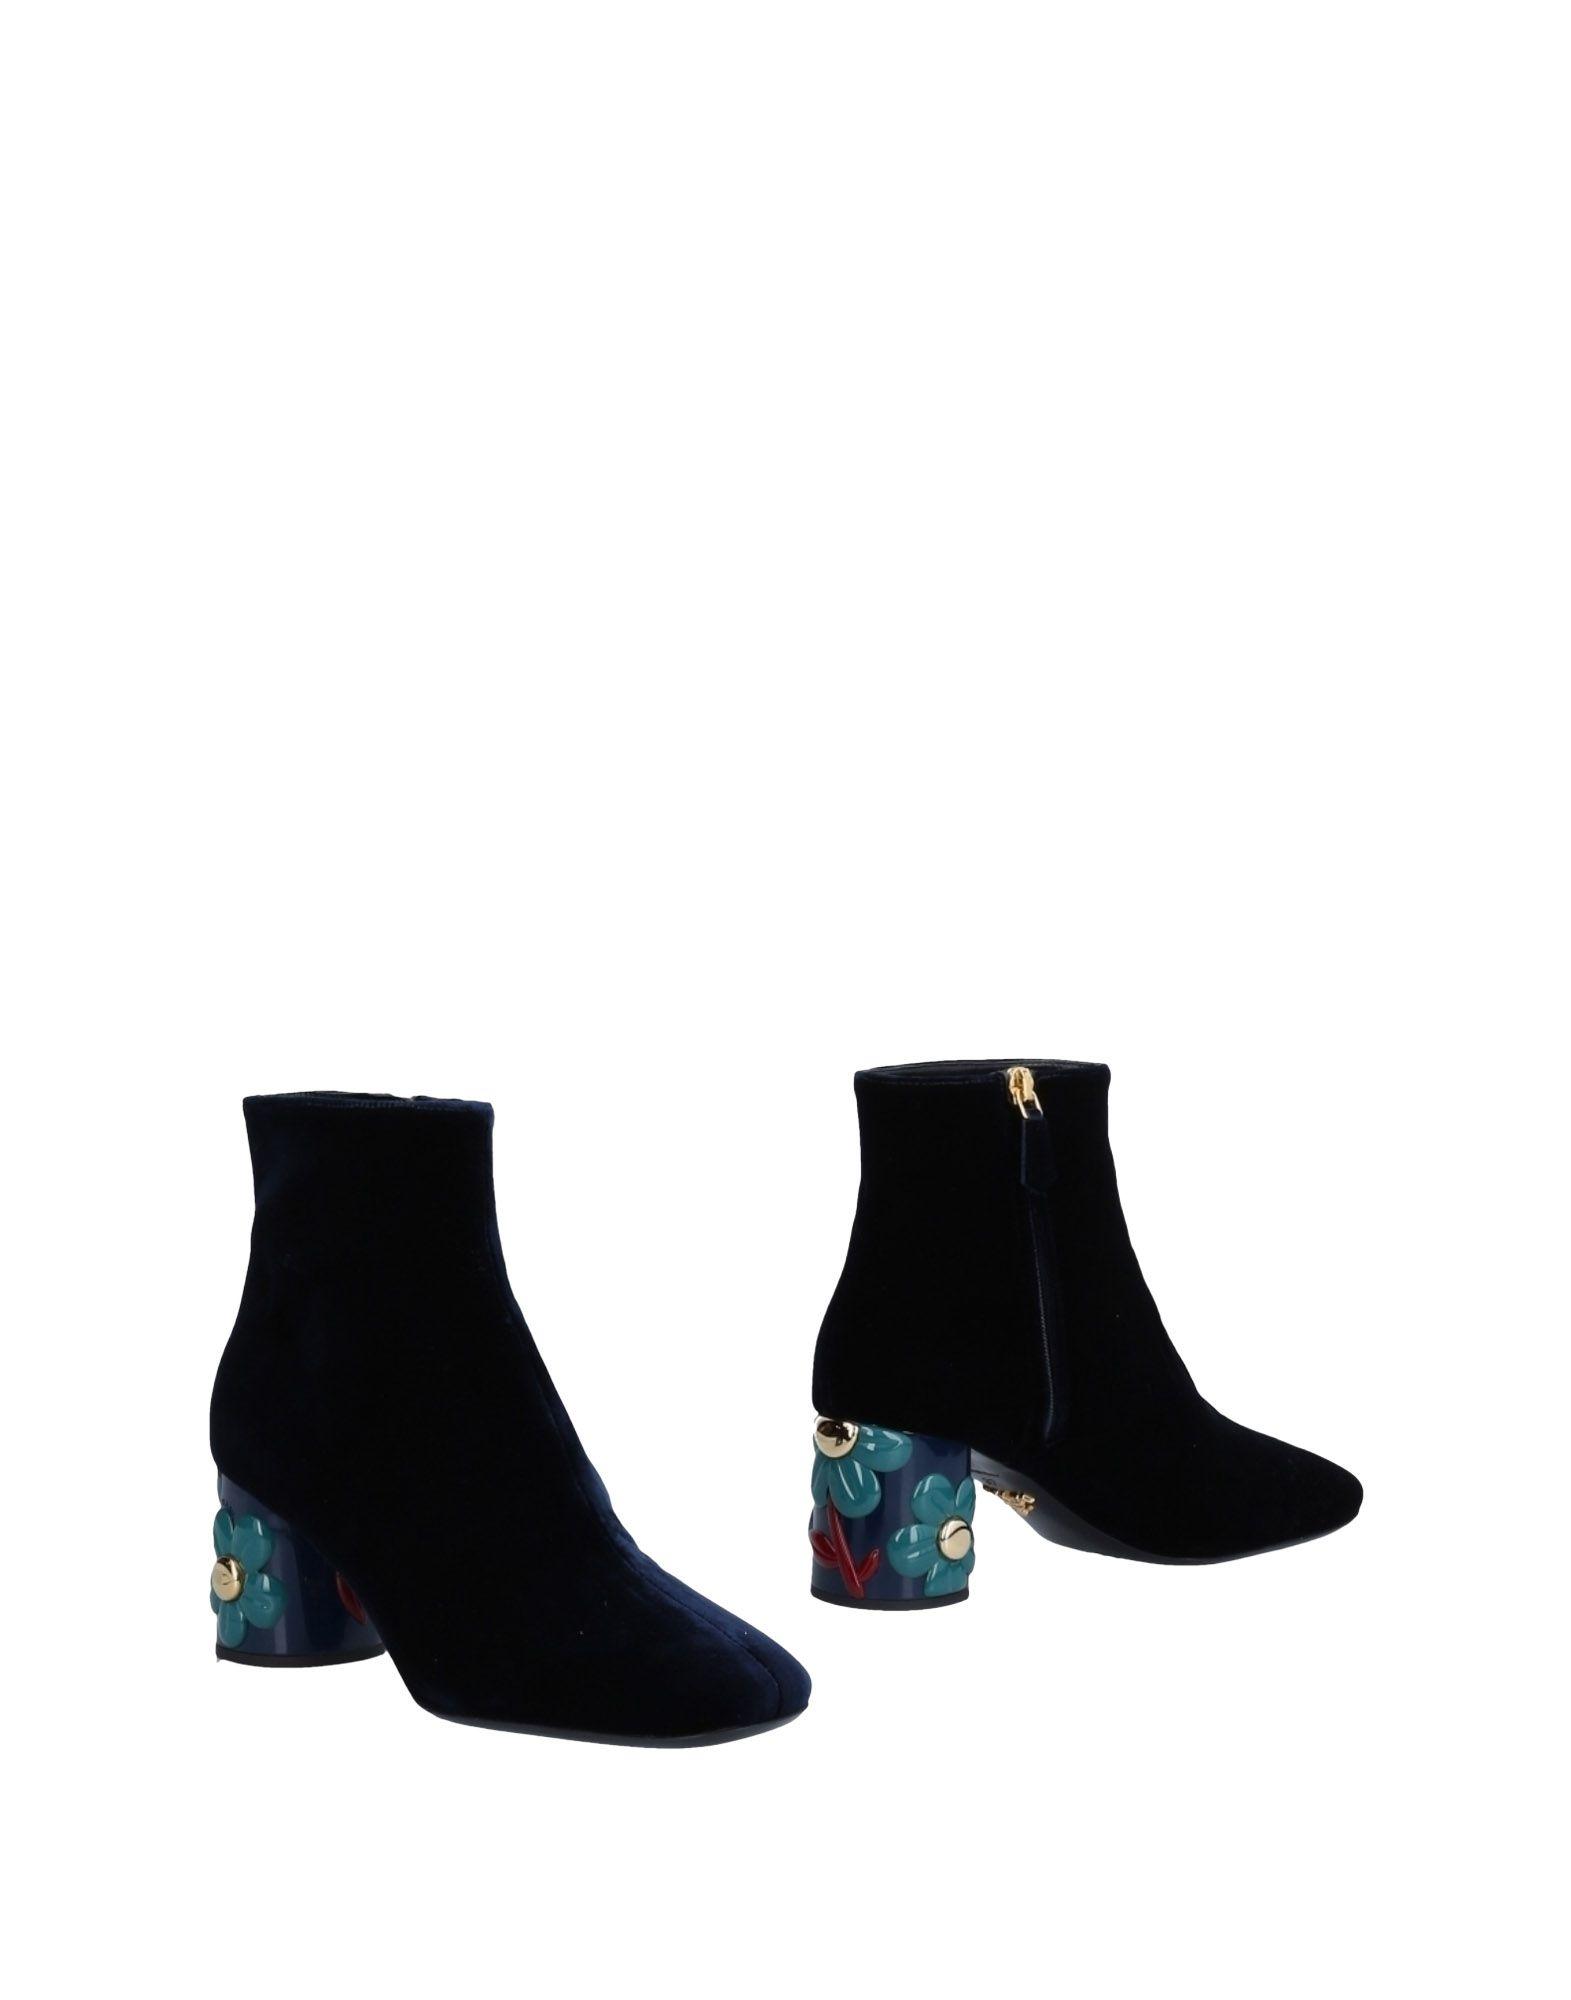 Prada Ankle Ankle Boot - Women Prada Ankle Ankle Boots online on  United Kingdom - 11489491WX 566694